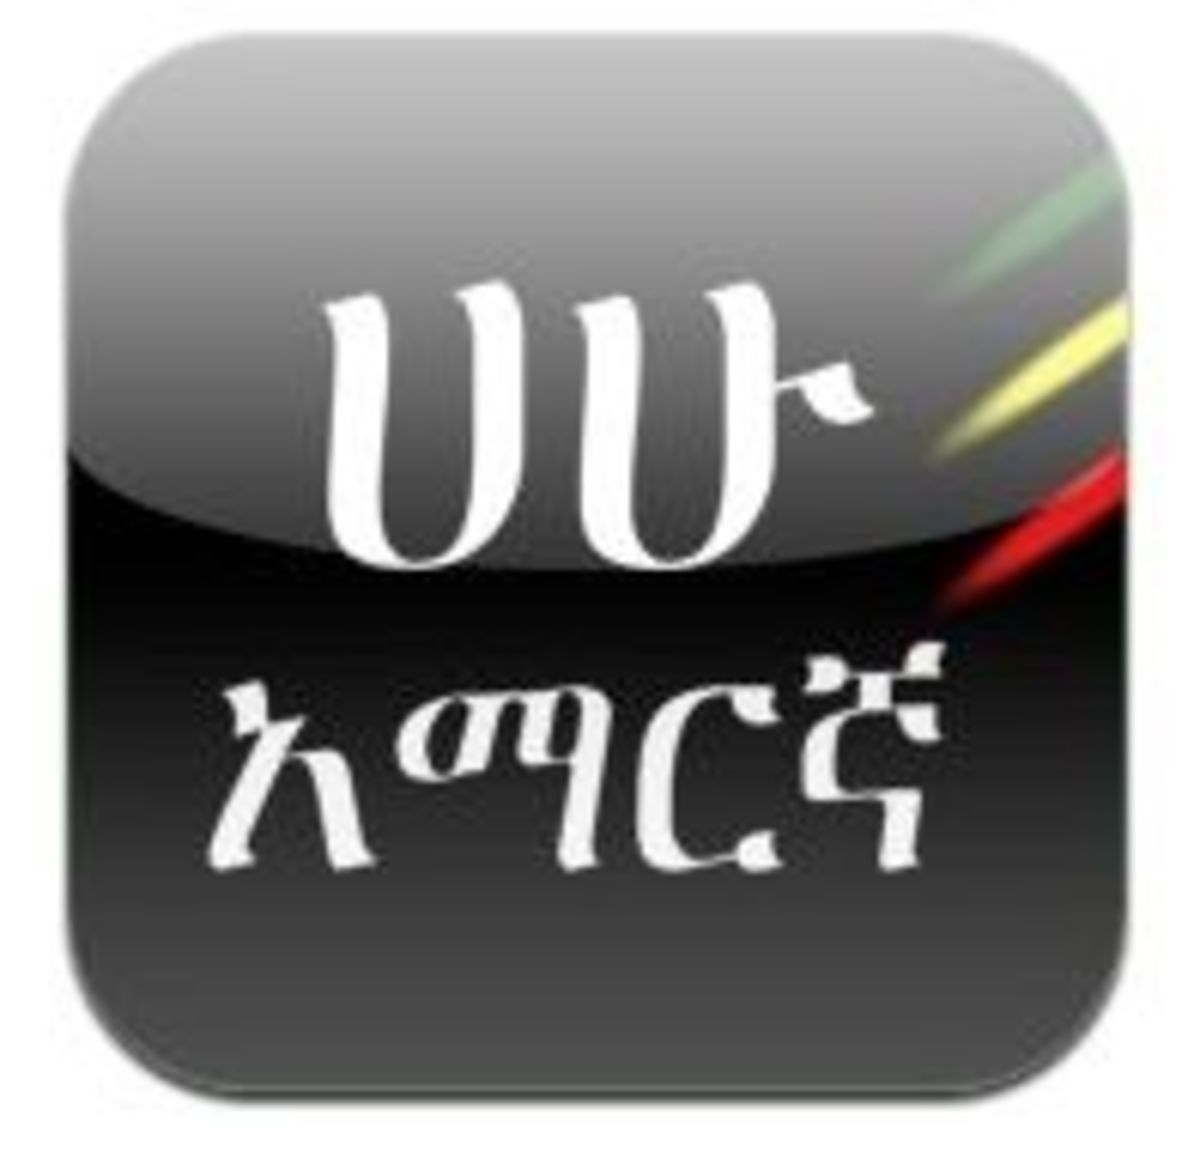 Amharic iPhone iPad aps